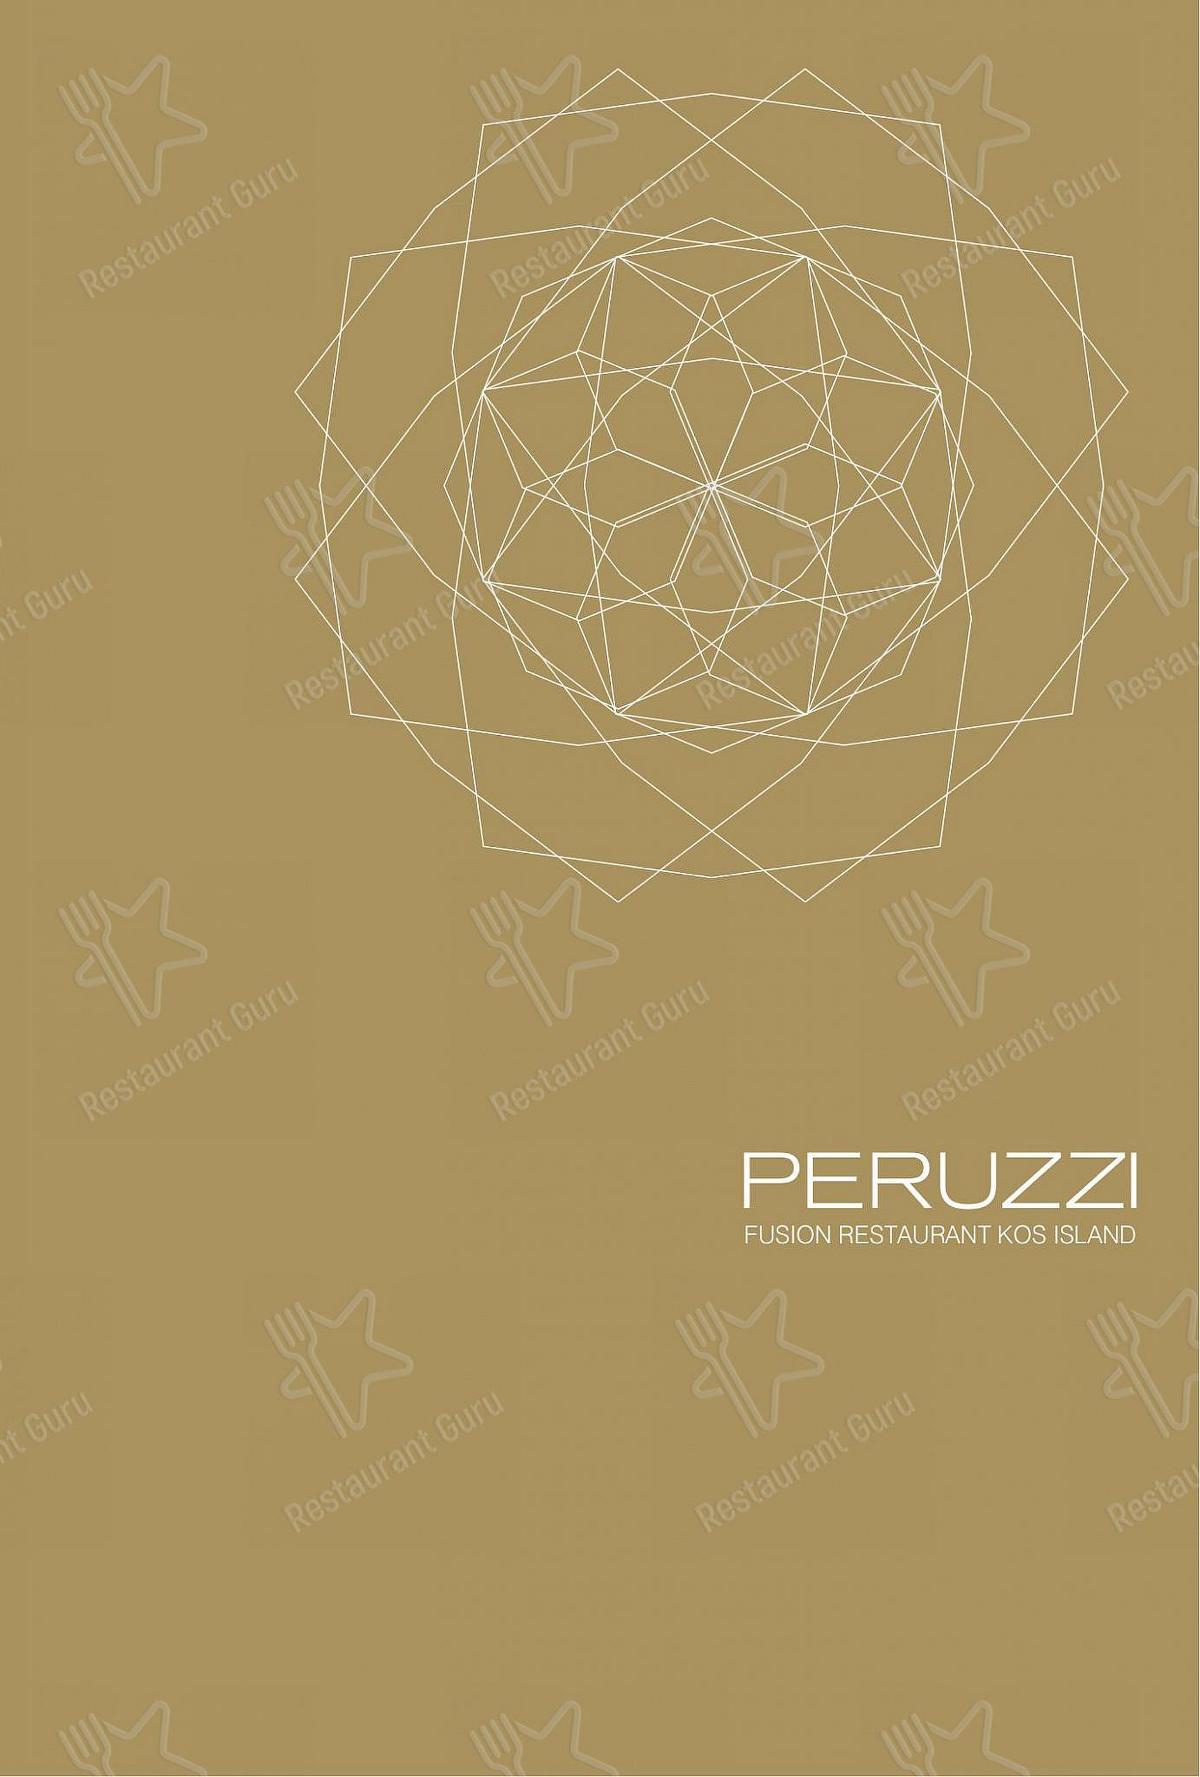 Food Menu for the Peruzzi Restaurant